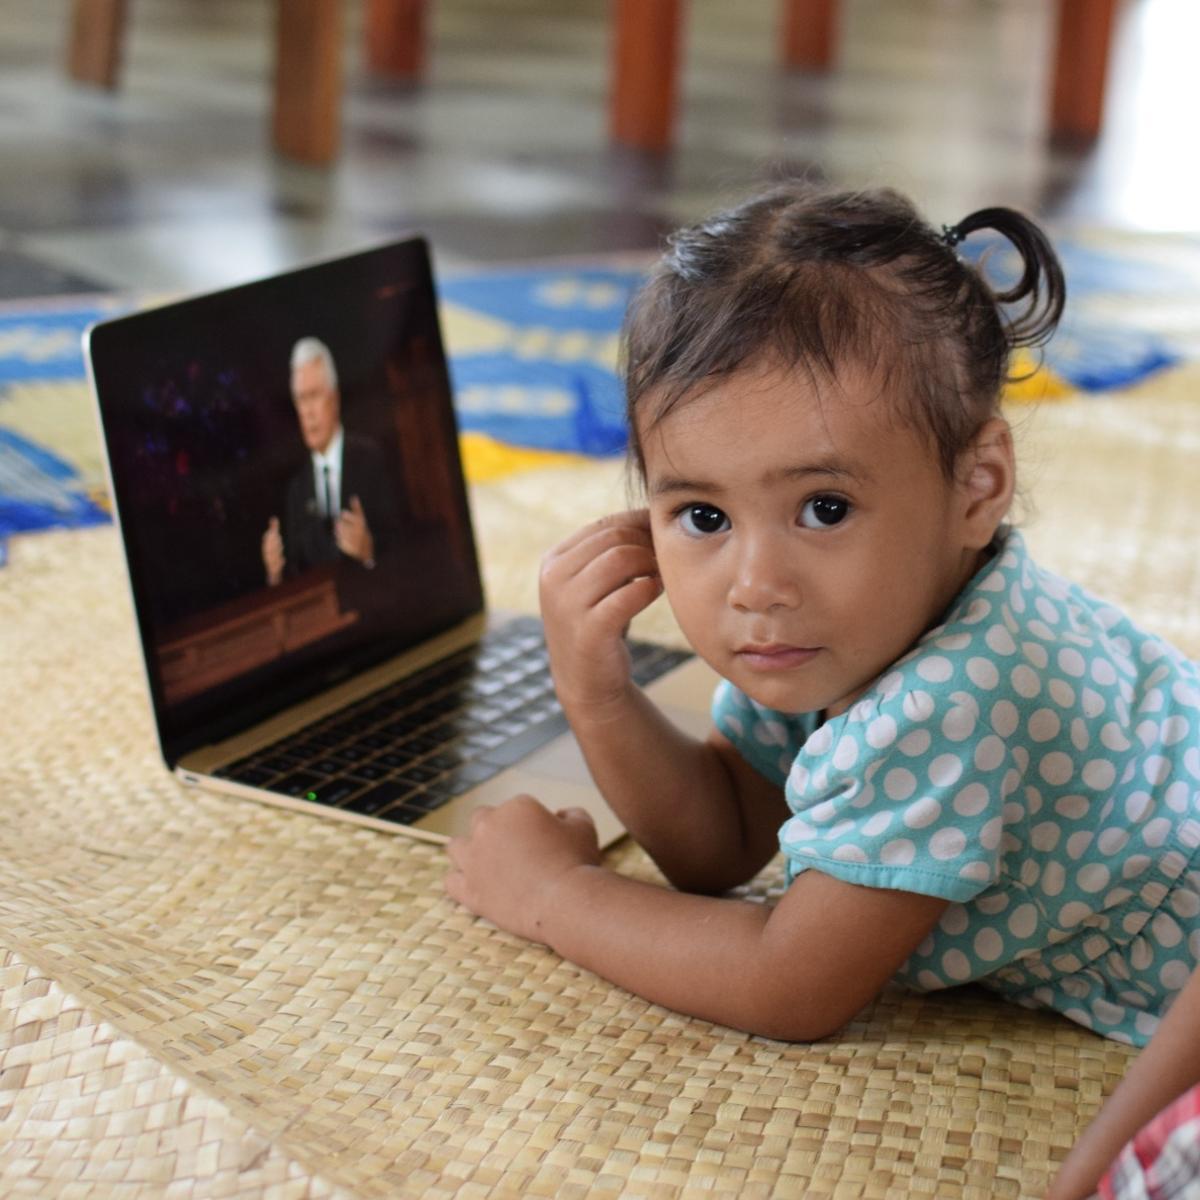 Children in Samoa listen to Elder Dieter F. Uchtdorf of the Quorum of the Twelve speak at general conference on Saturday, October 3, 2020.